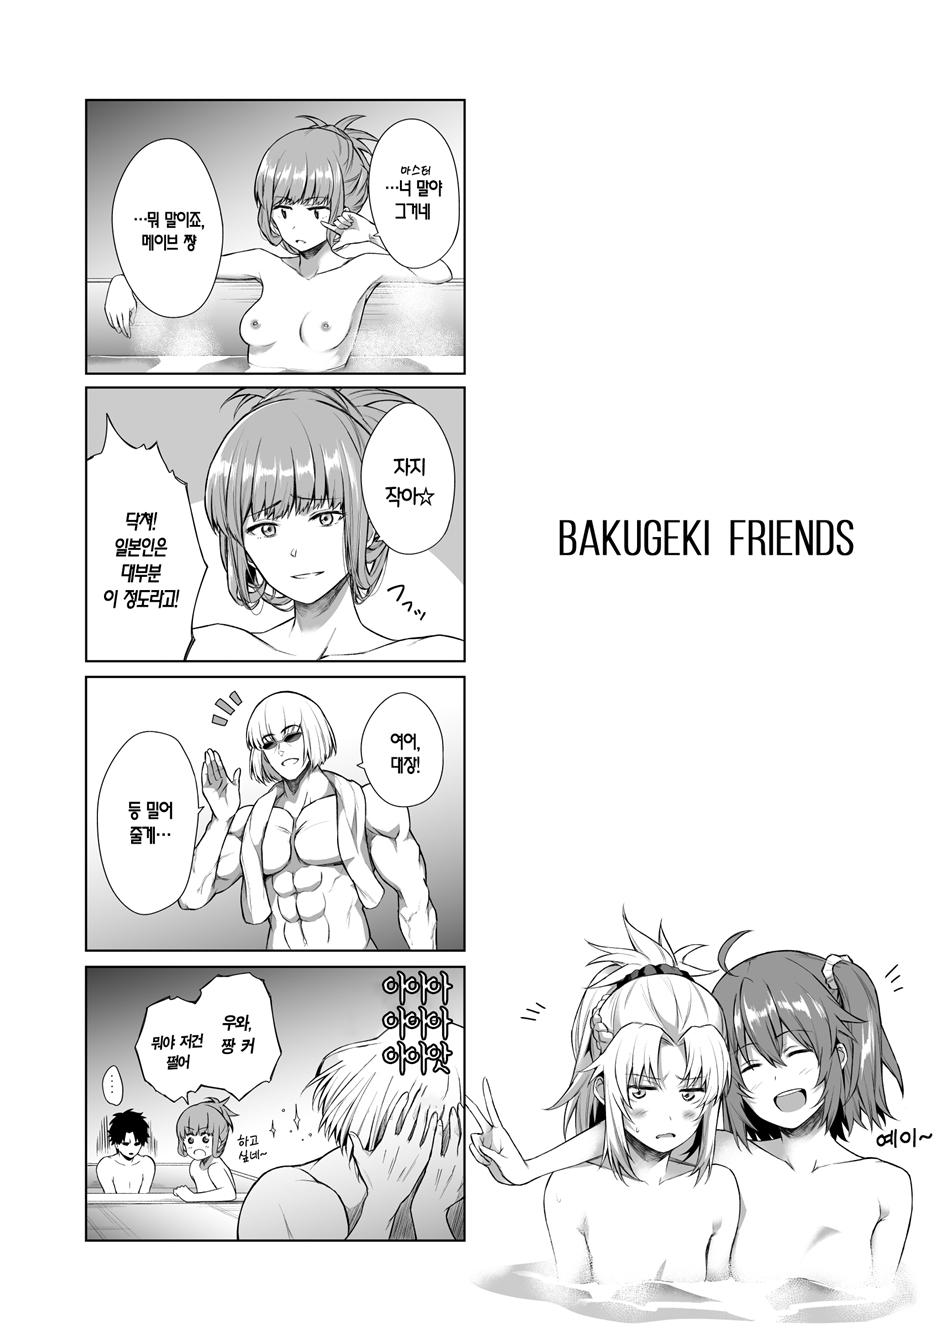 02_77477617_p1_webbakugeki_friends.jpg